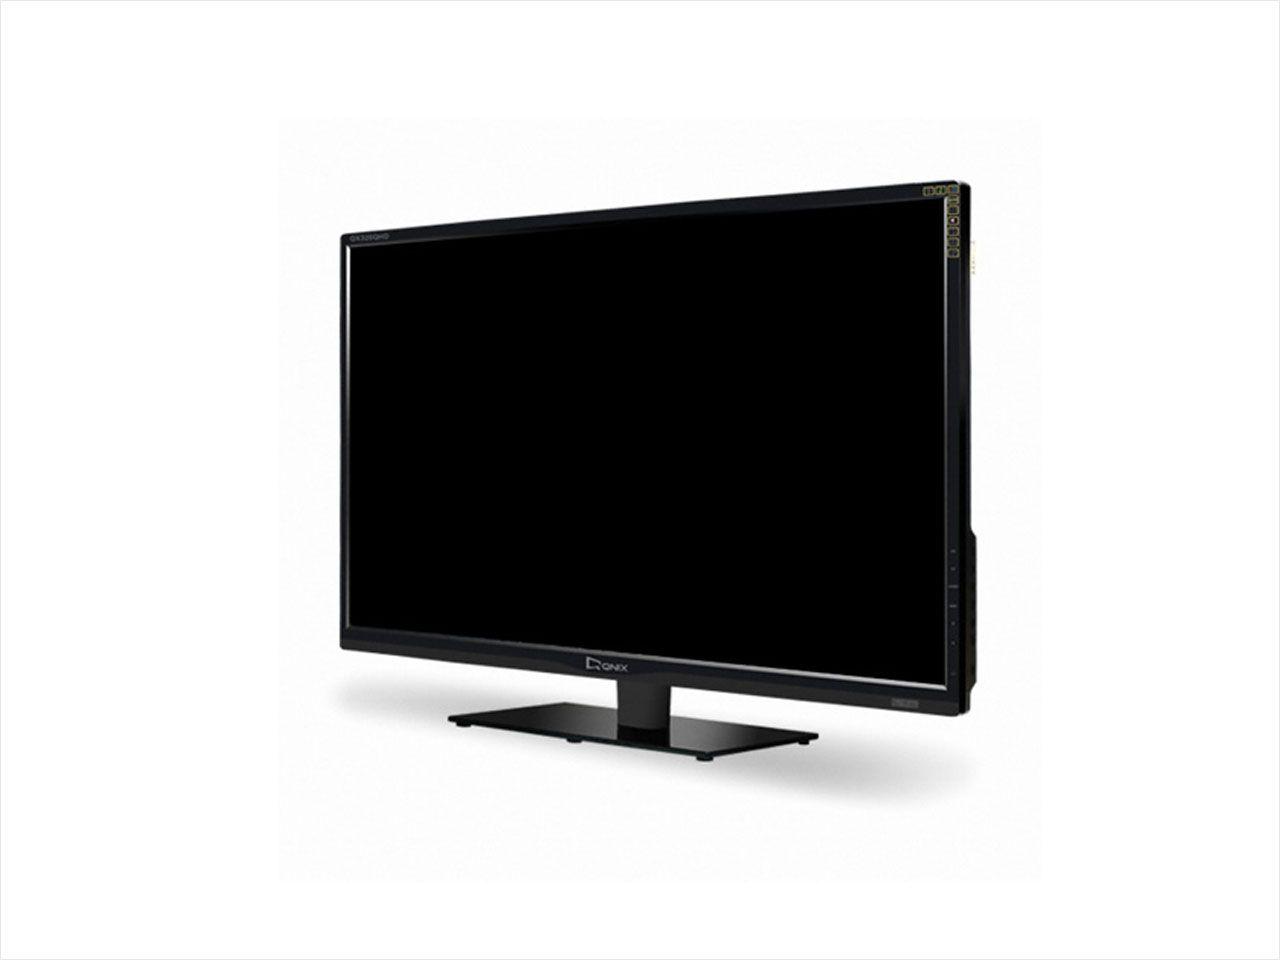 "QNIX Super Ultra DP Eco 32"" WQHD VA LED Monitor $299@NF"